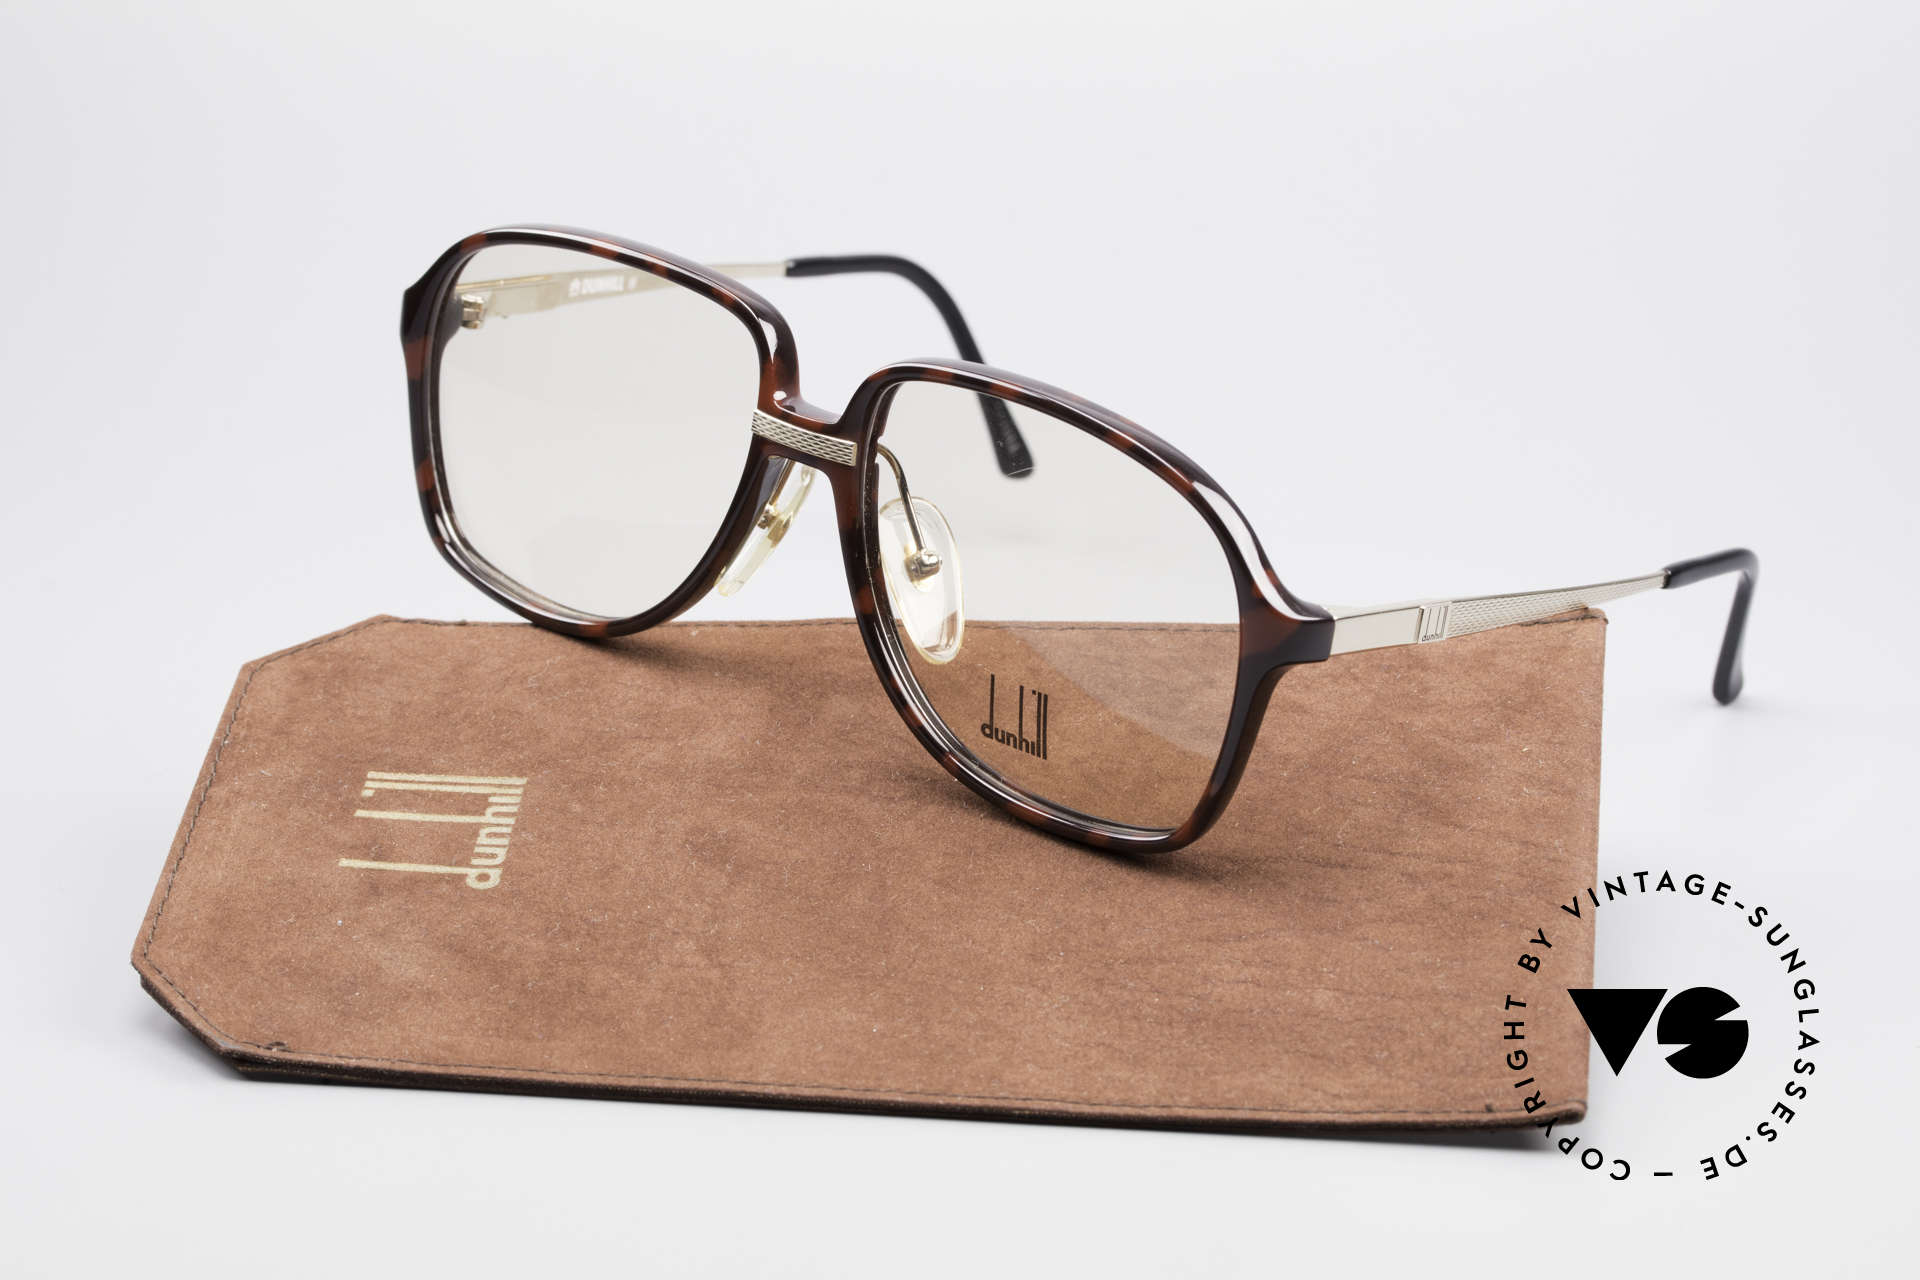 Dunhill 6053 80's Vintage Eyeglasses Men, NO RETRO SPECS, but a rare 30 years old original!!, Made for Men